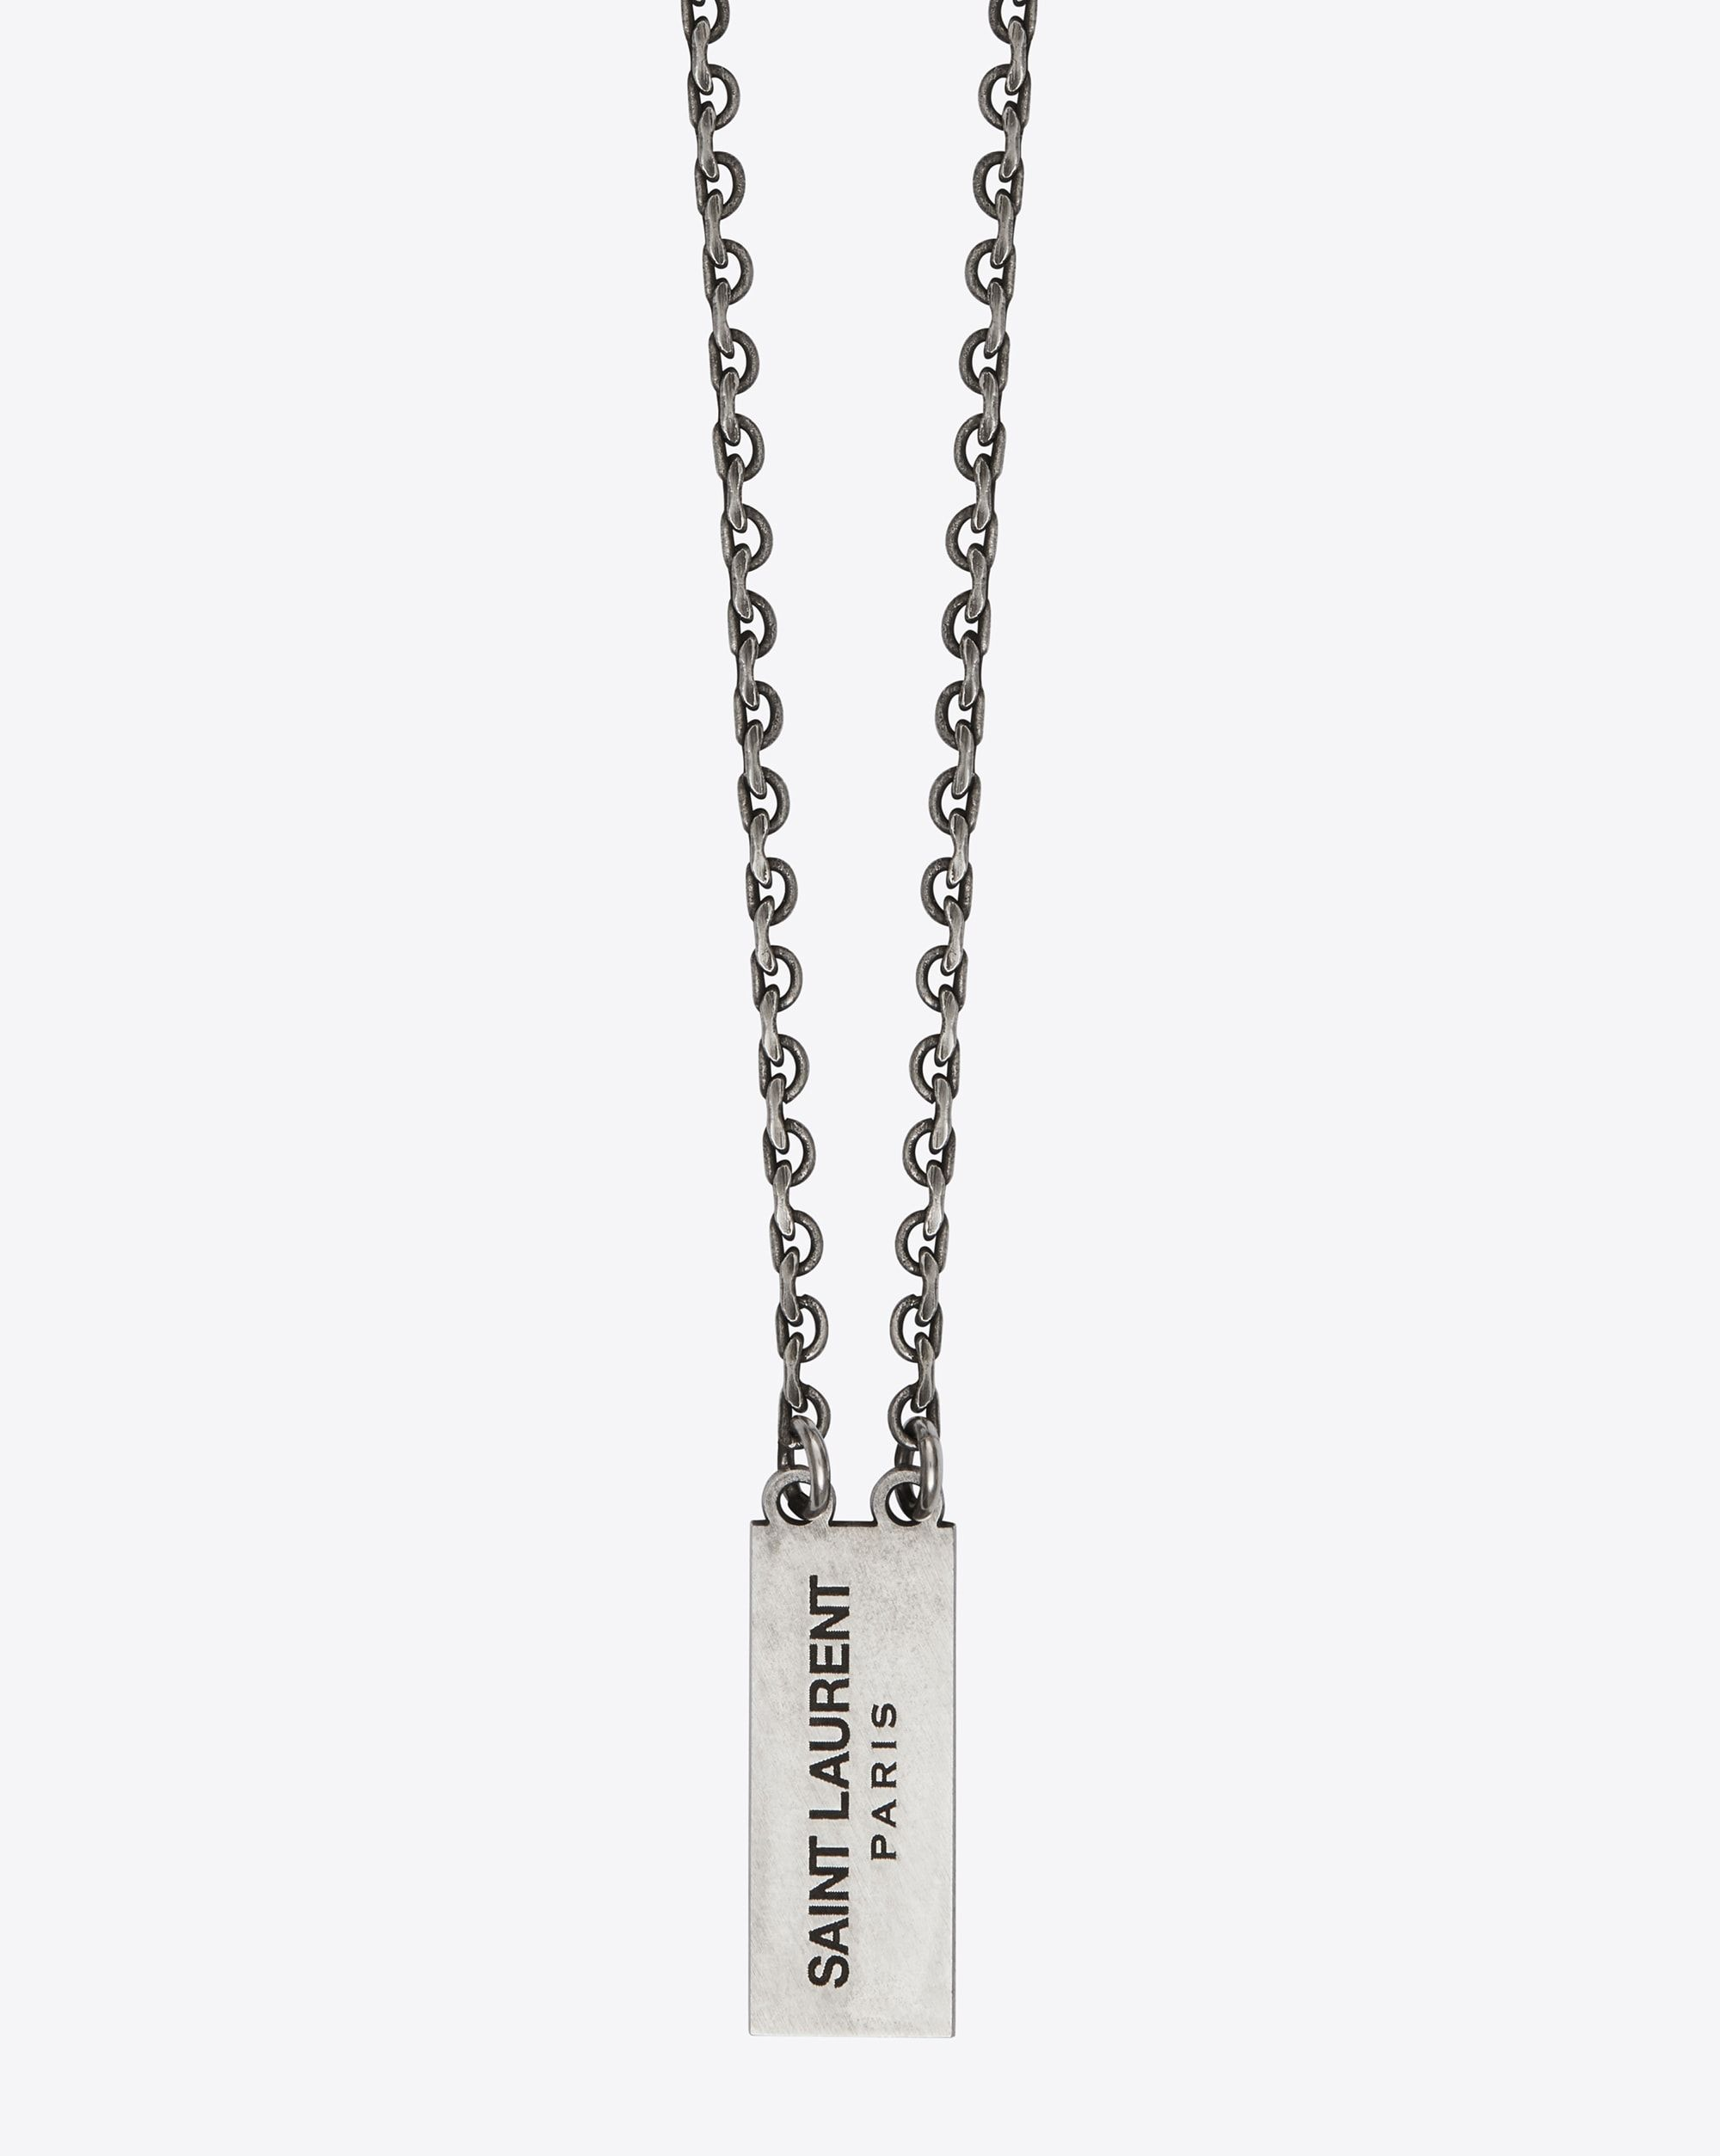 b52b6d6eb8 $495 Saint Laurent CHAINS Necklace With Double Oxidized Silver ...